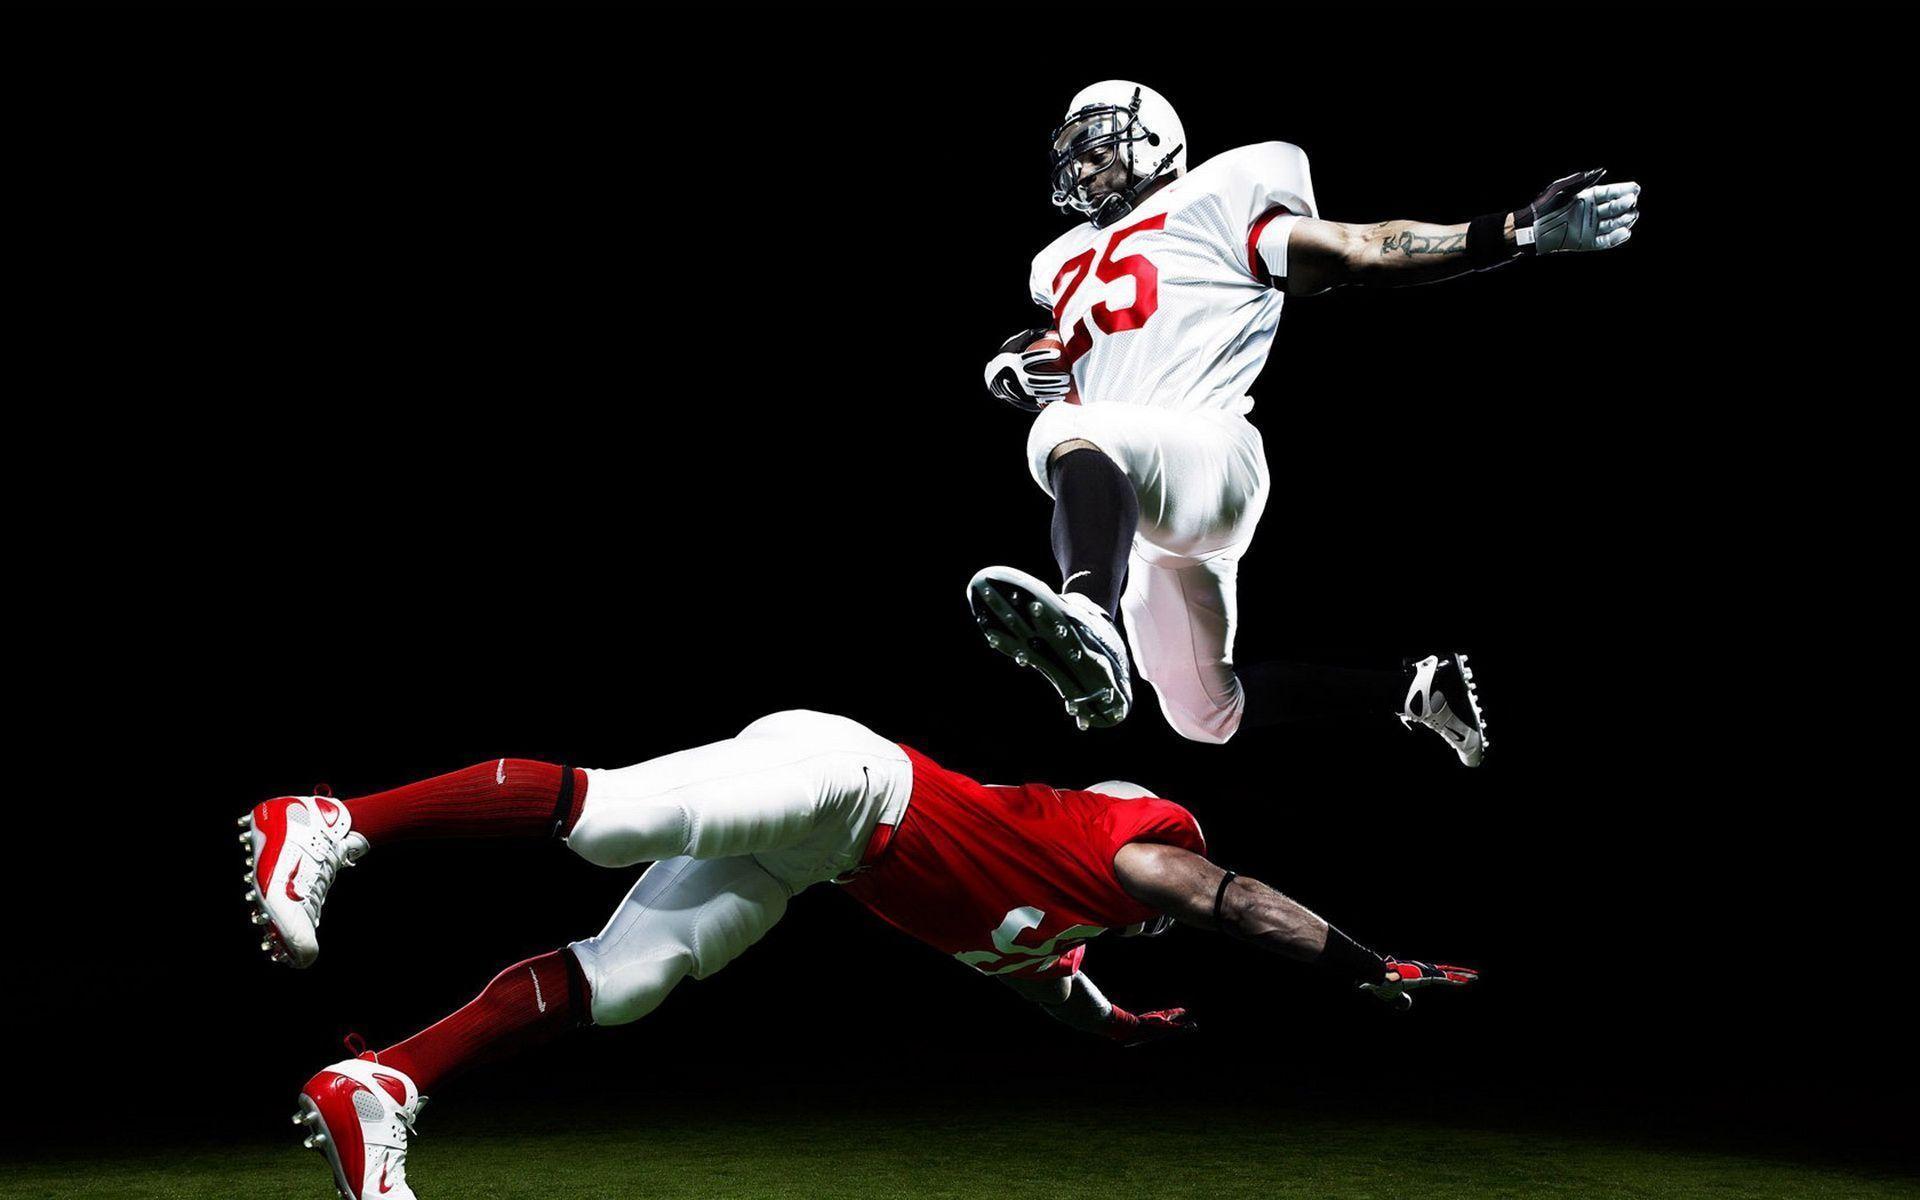 American Football Wallpapers Maker Pro: Football Wallpapers